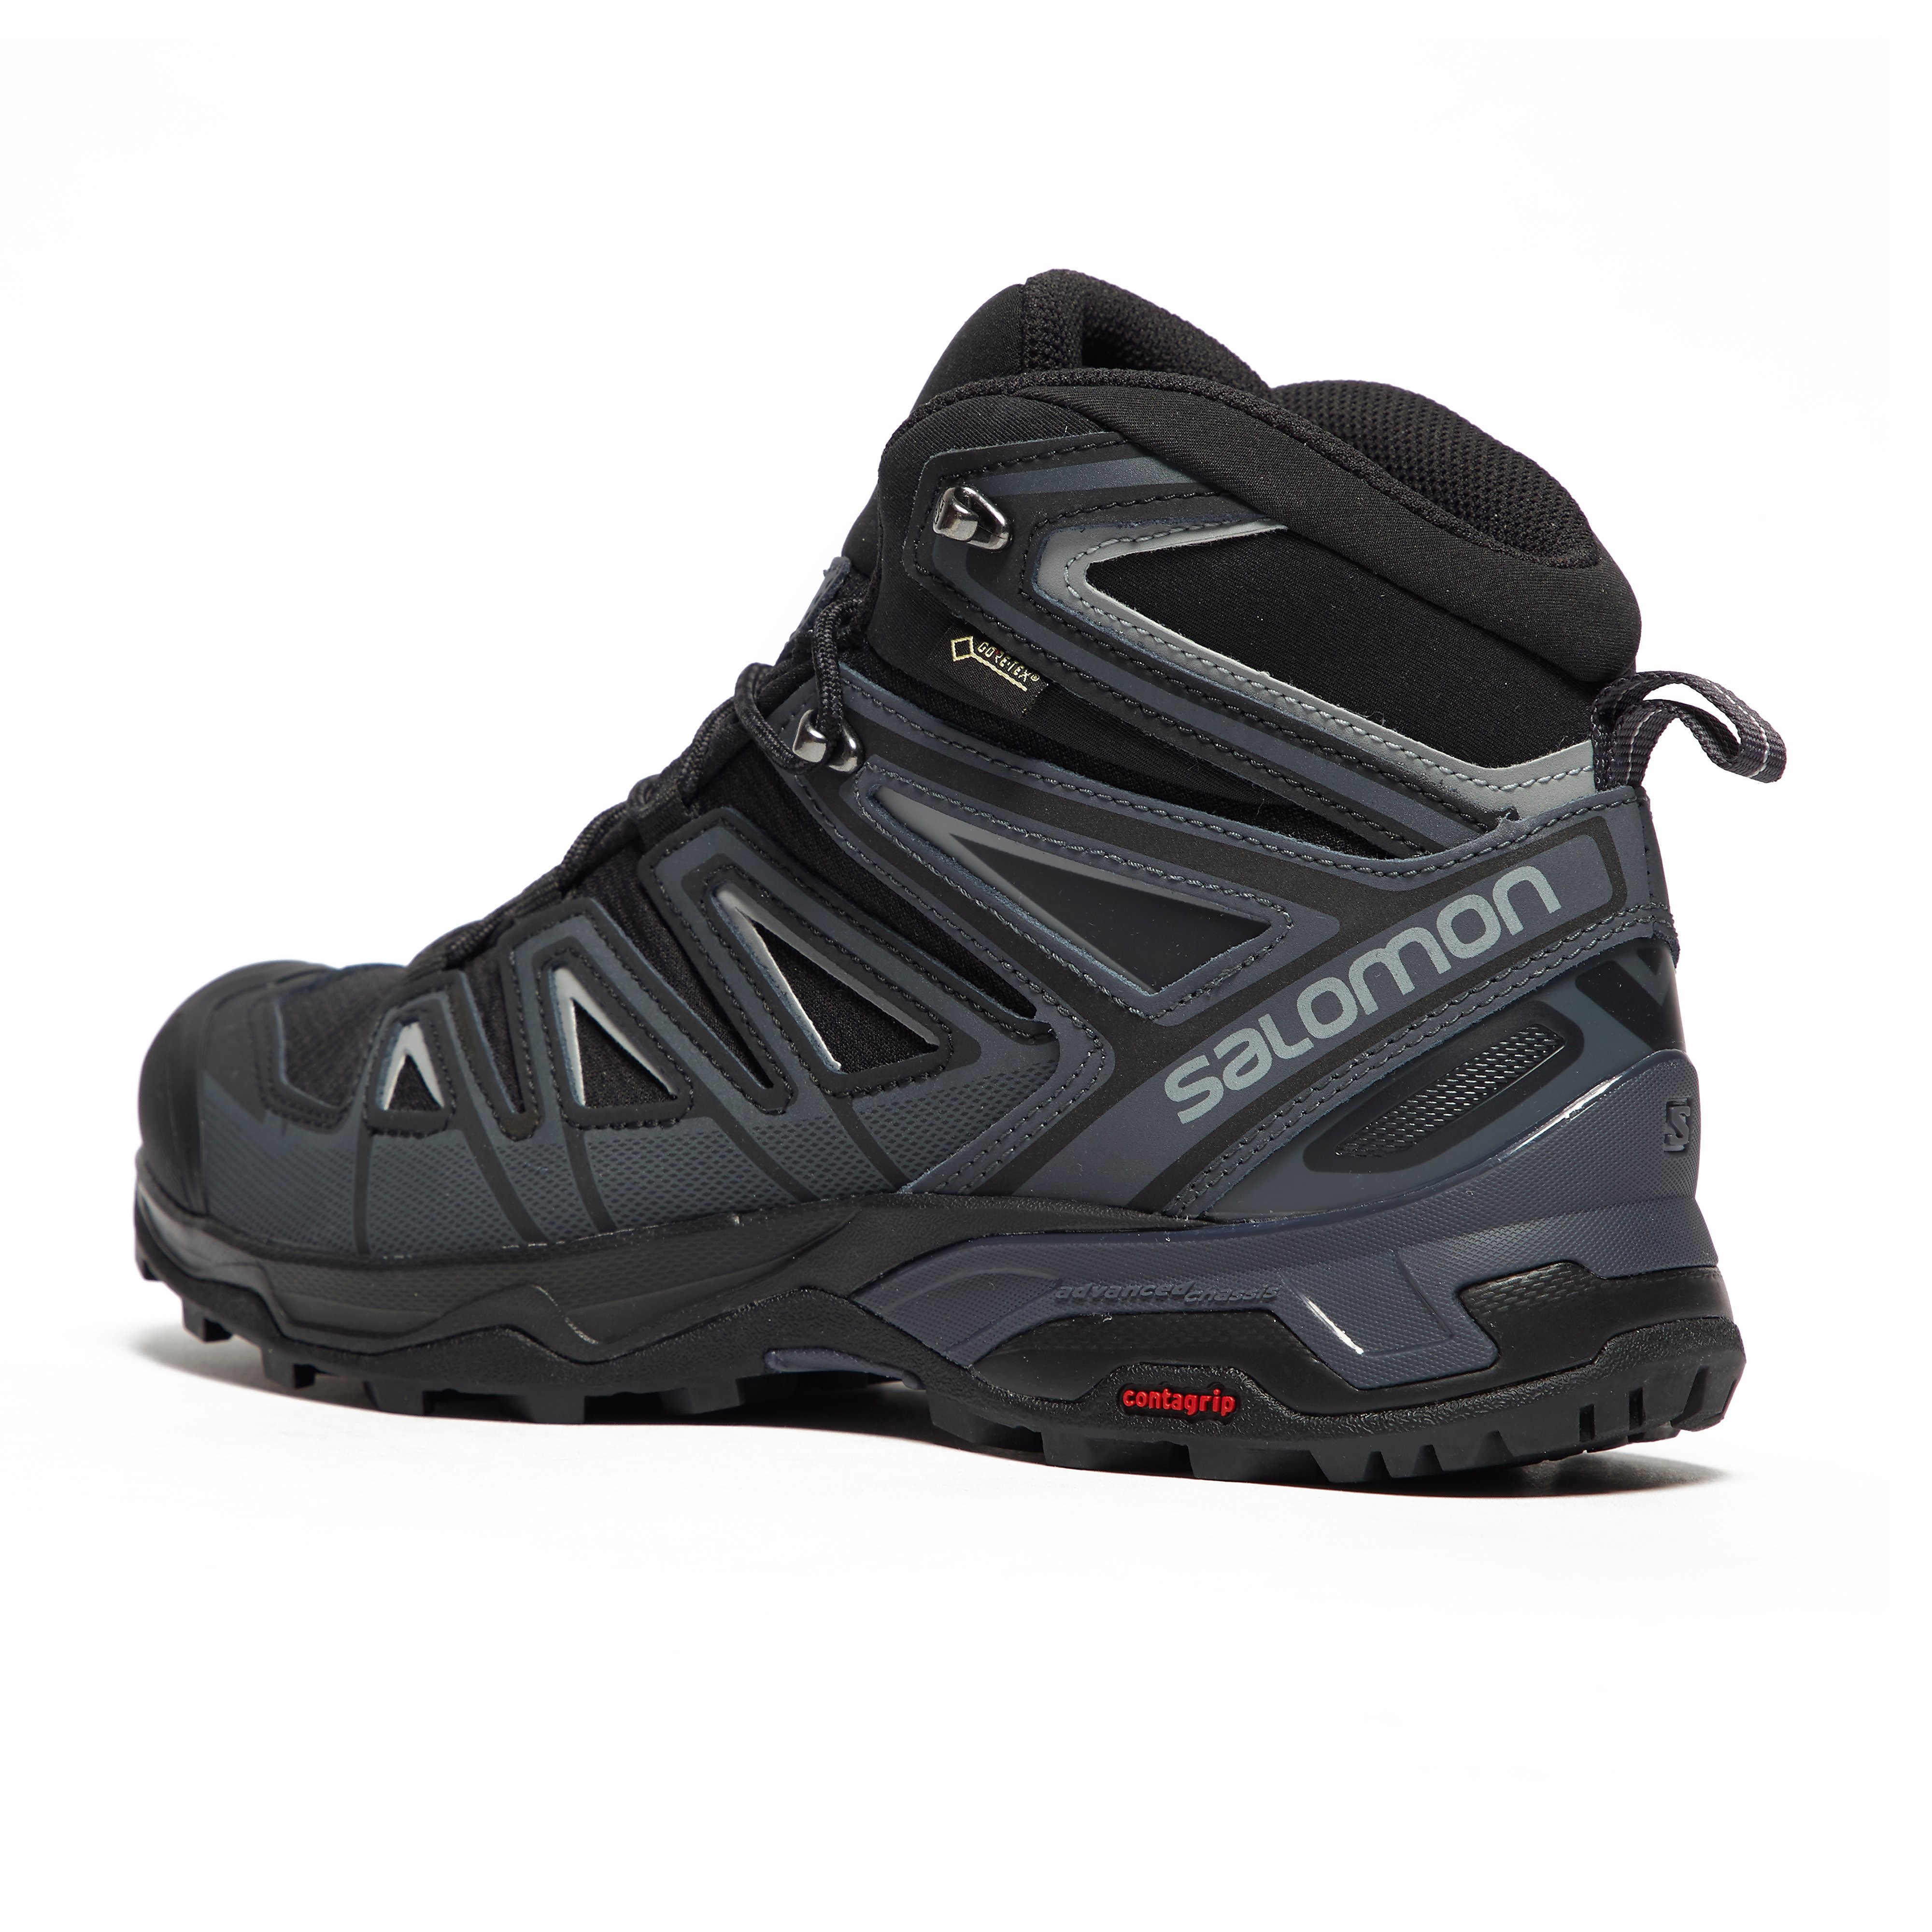 Salomon X ULTRA 3 Mid GTX Men's Hiking Boots